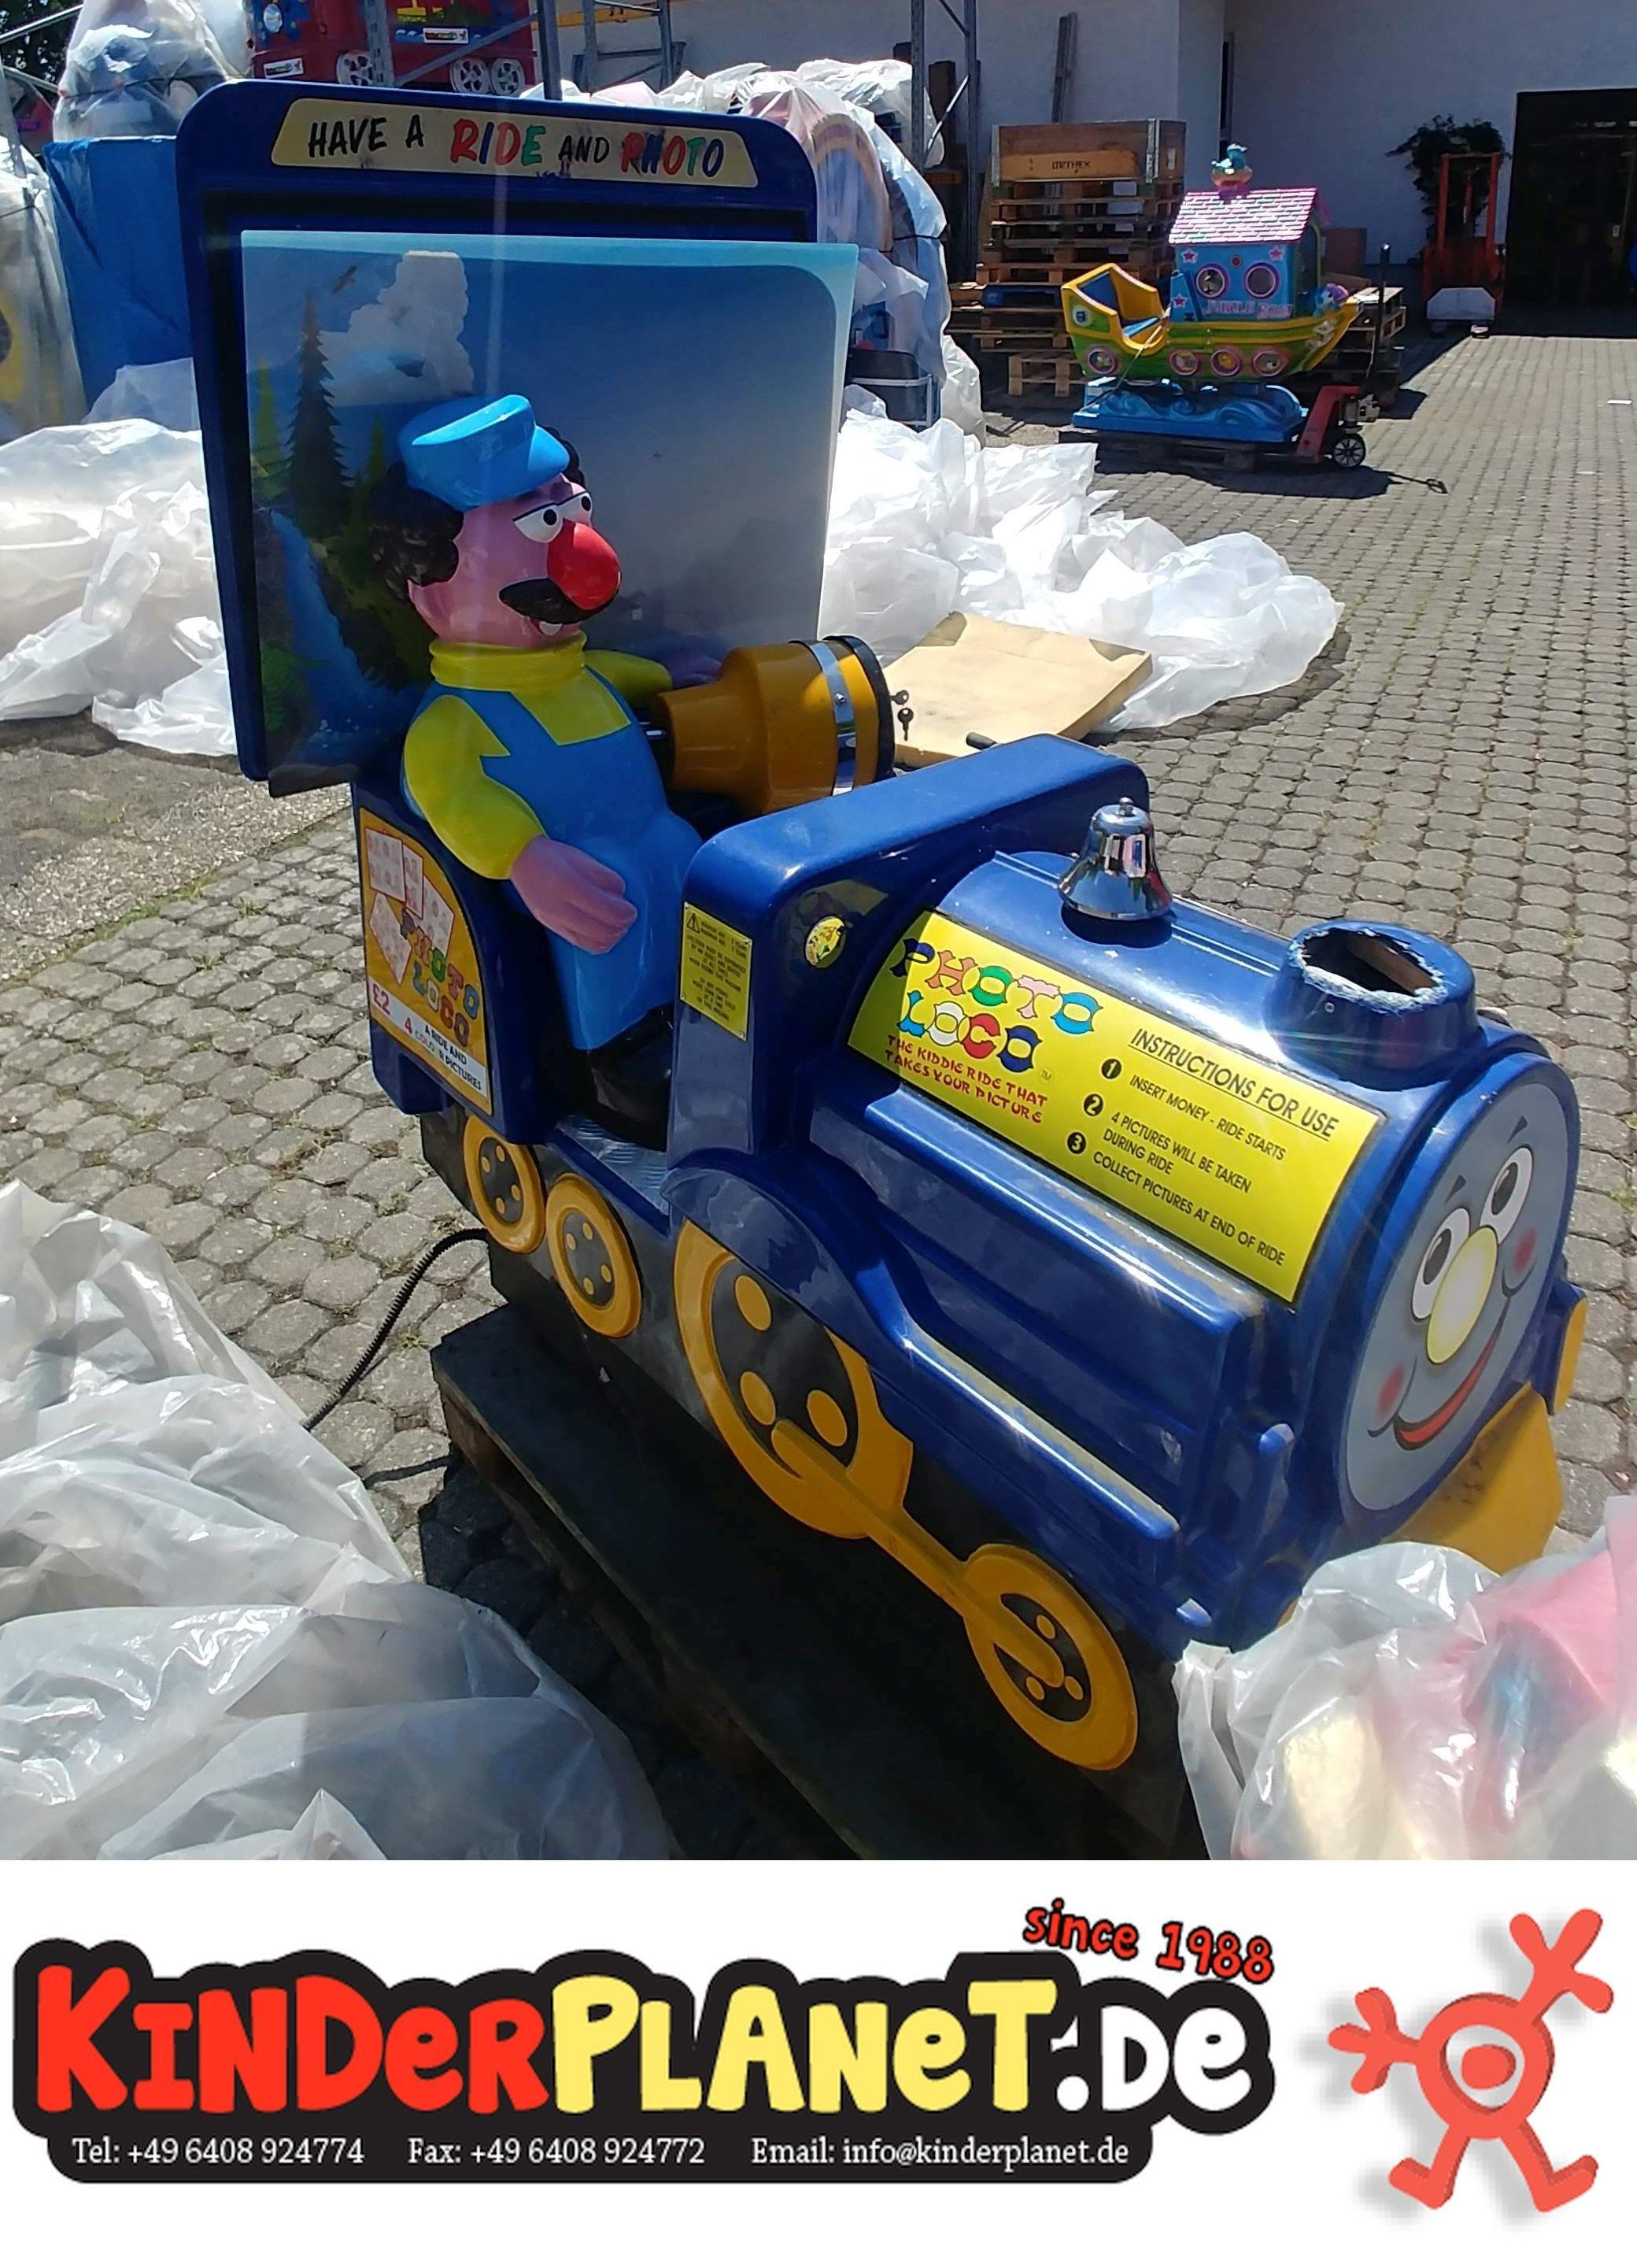 Lokomotive mit Henson-Comic-Figur als Lokführer